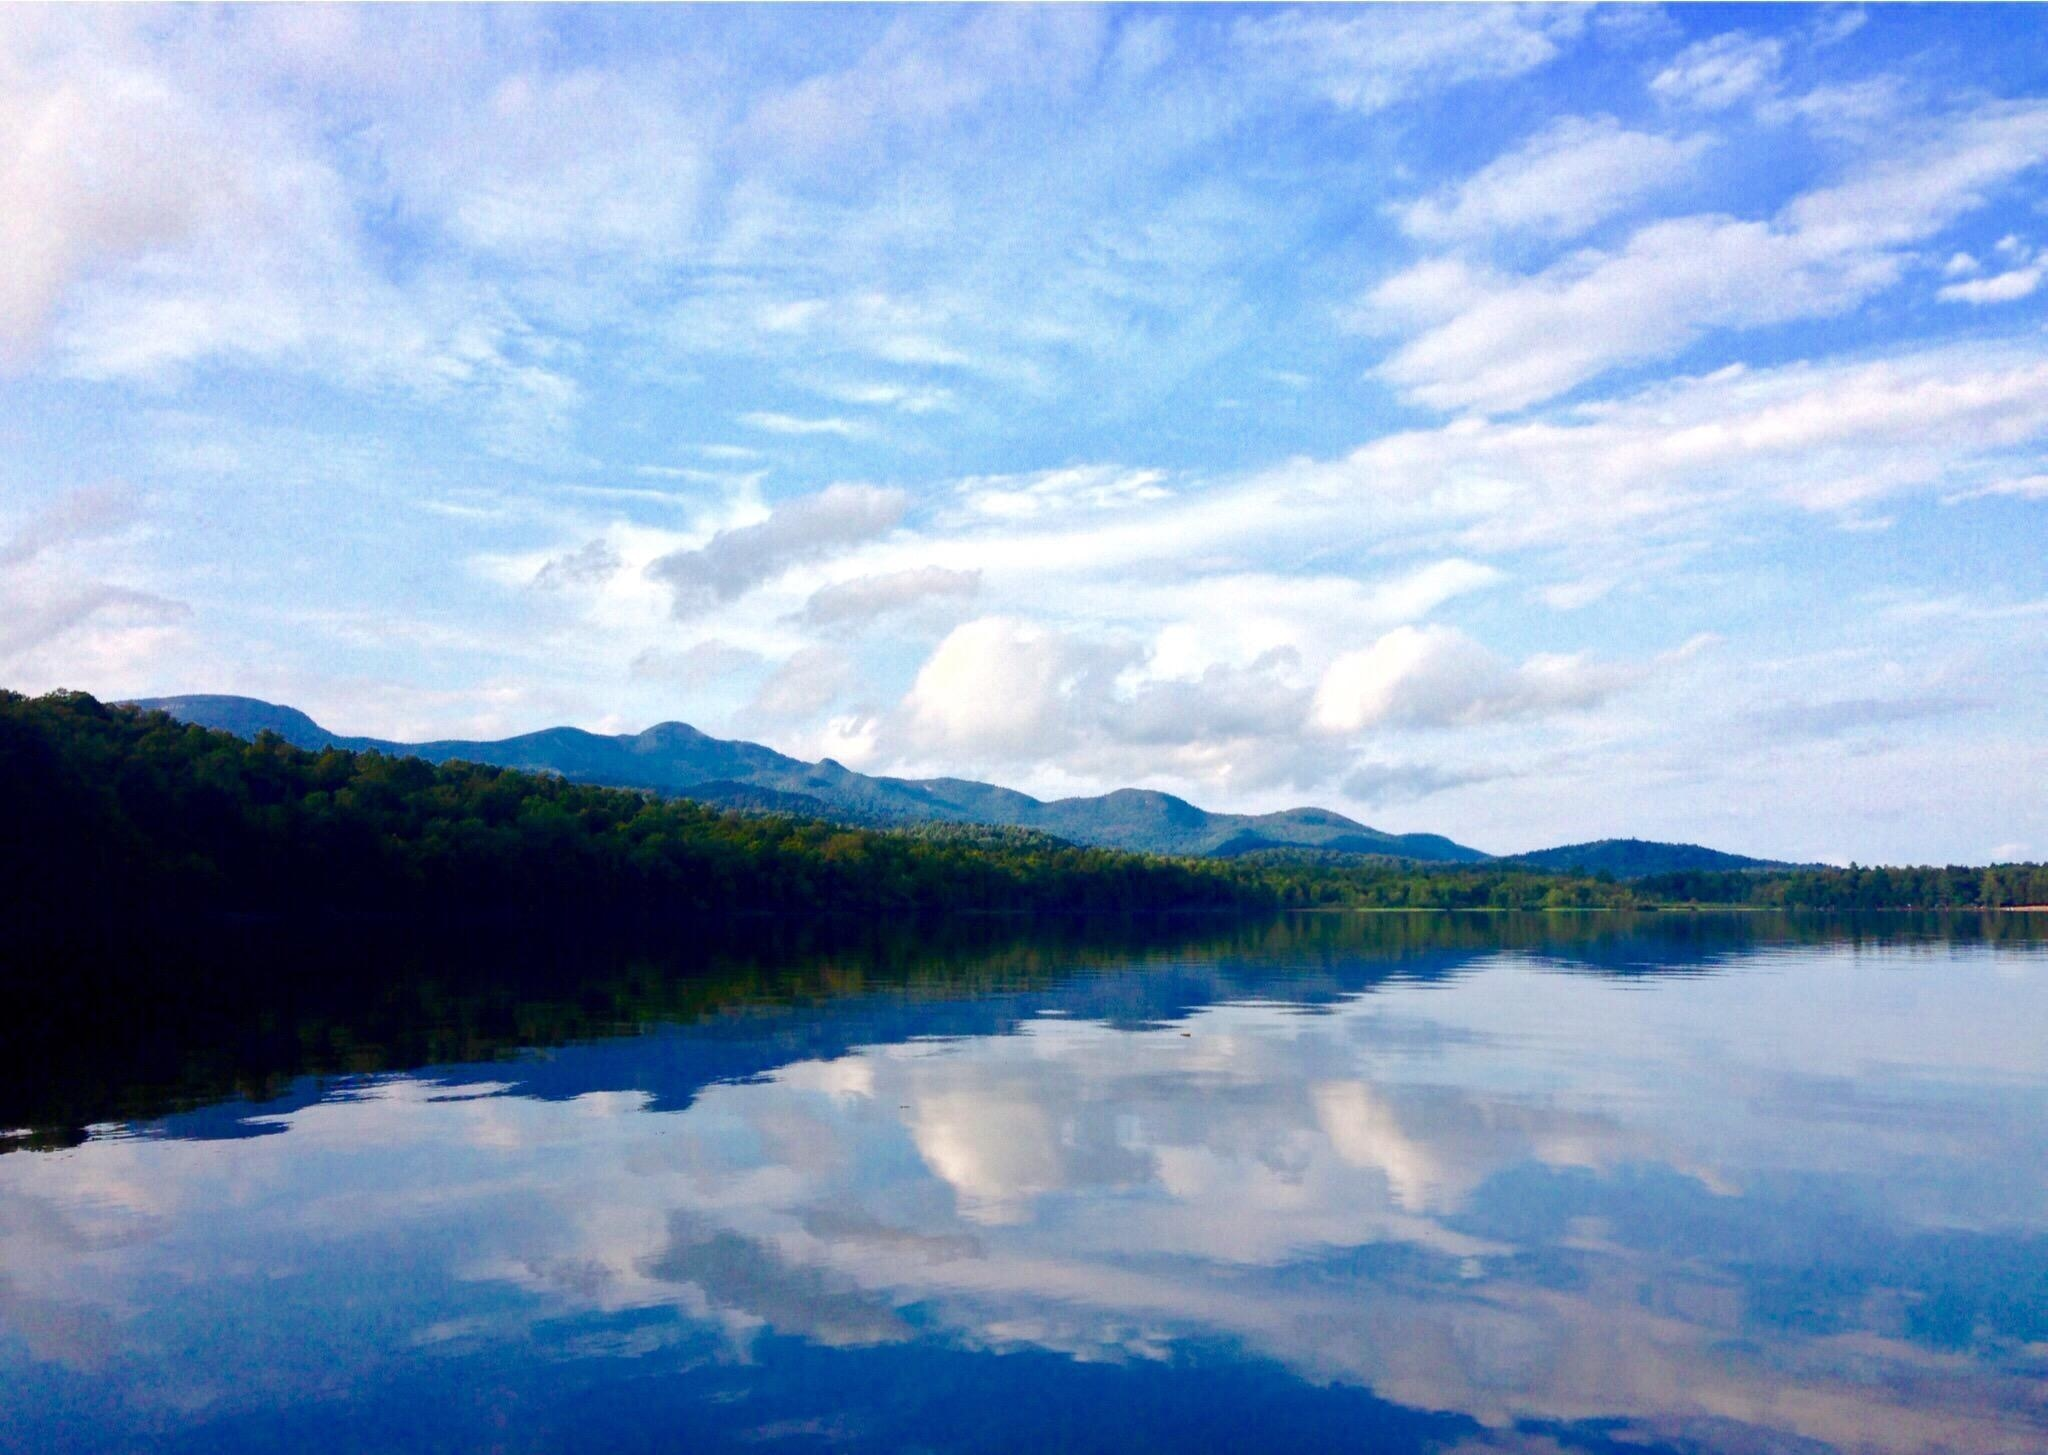 Indian Lake, New York, United States of America